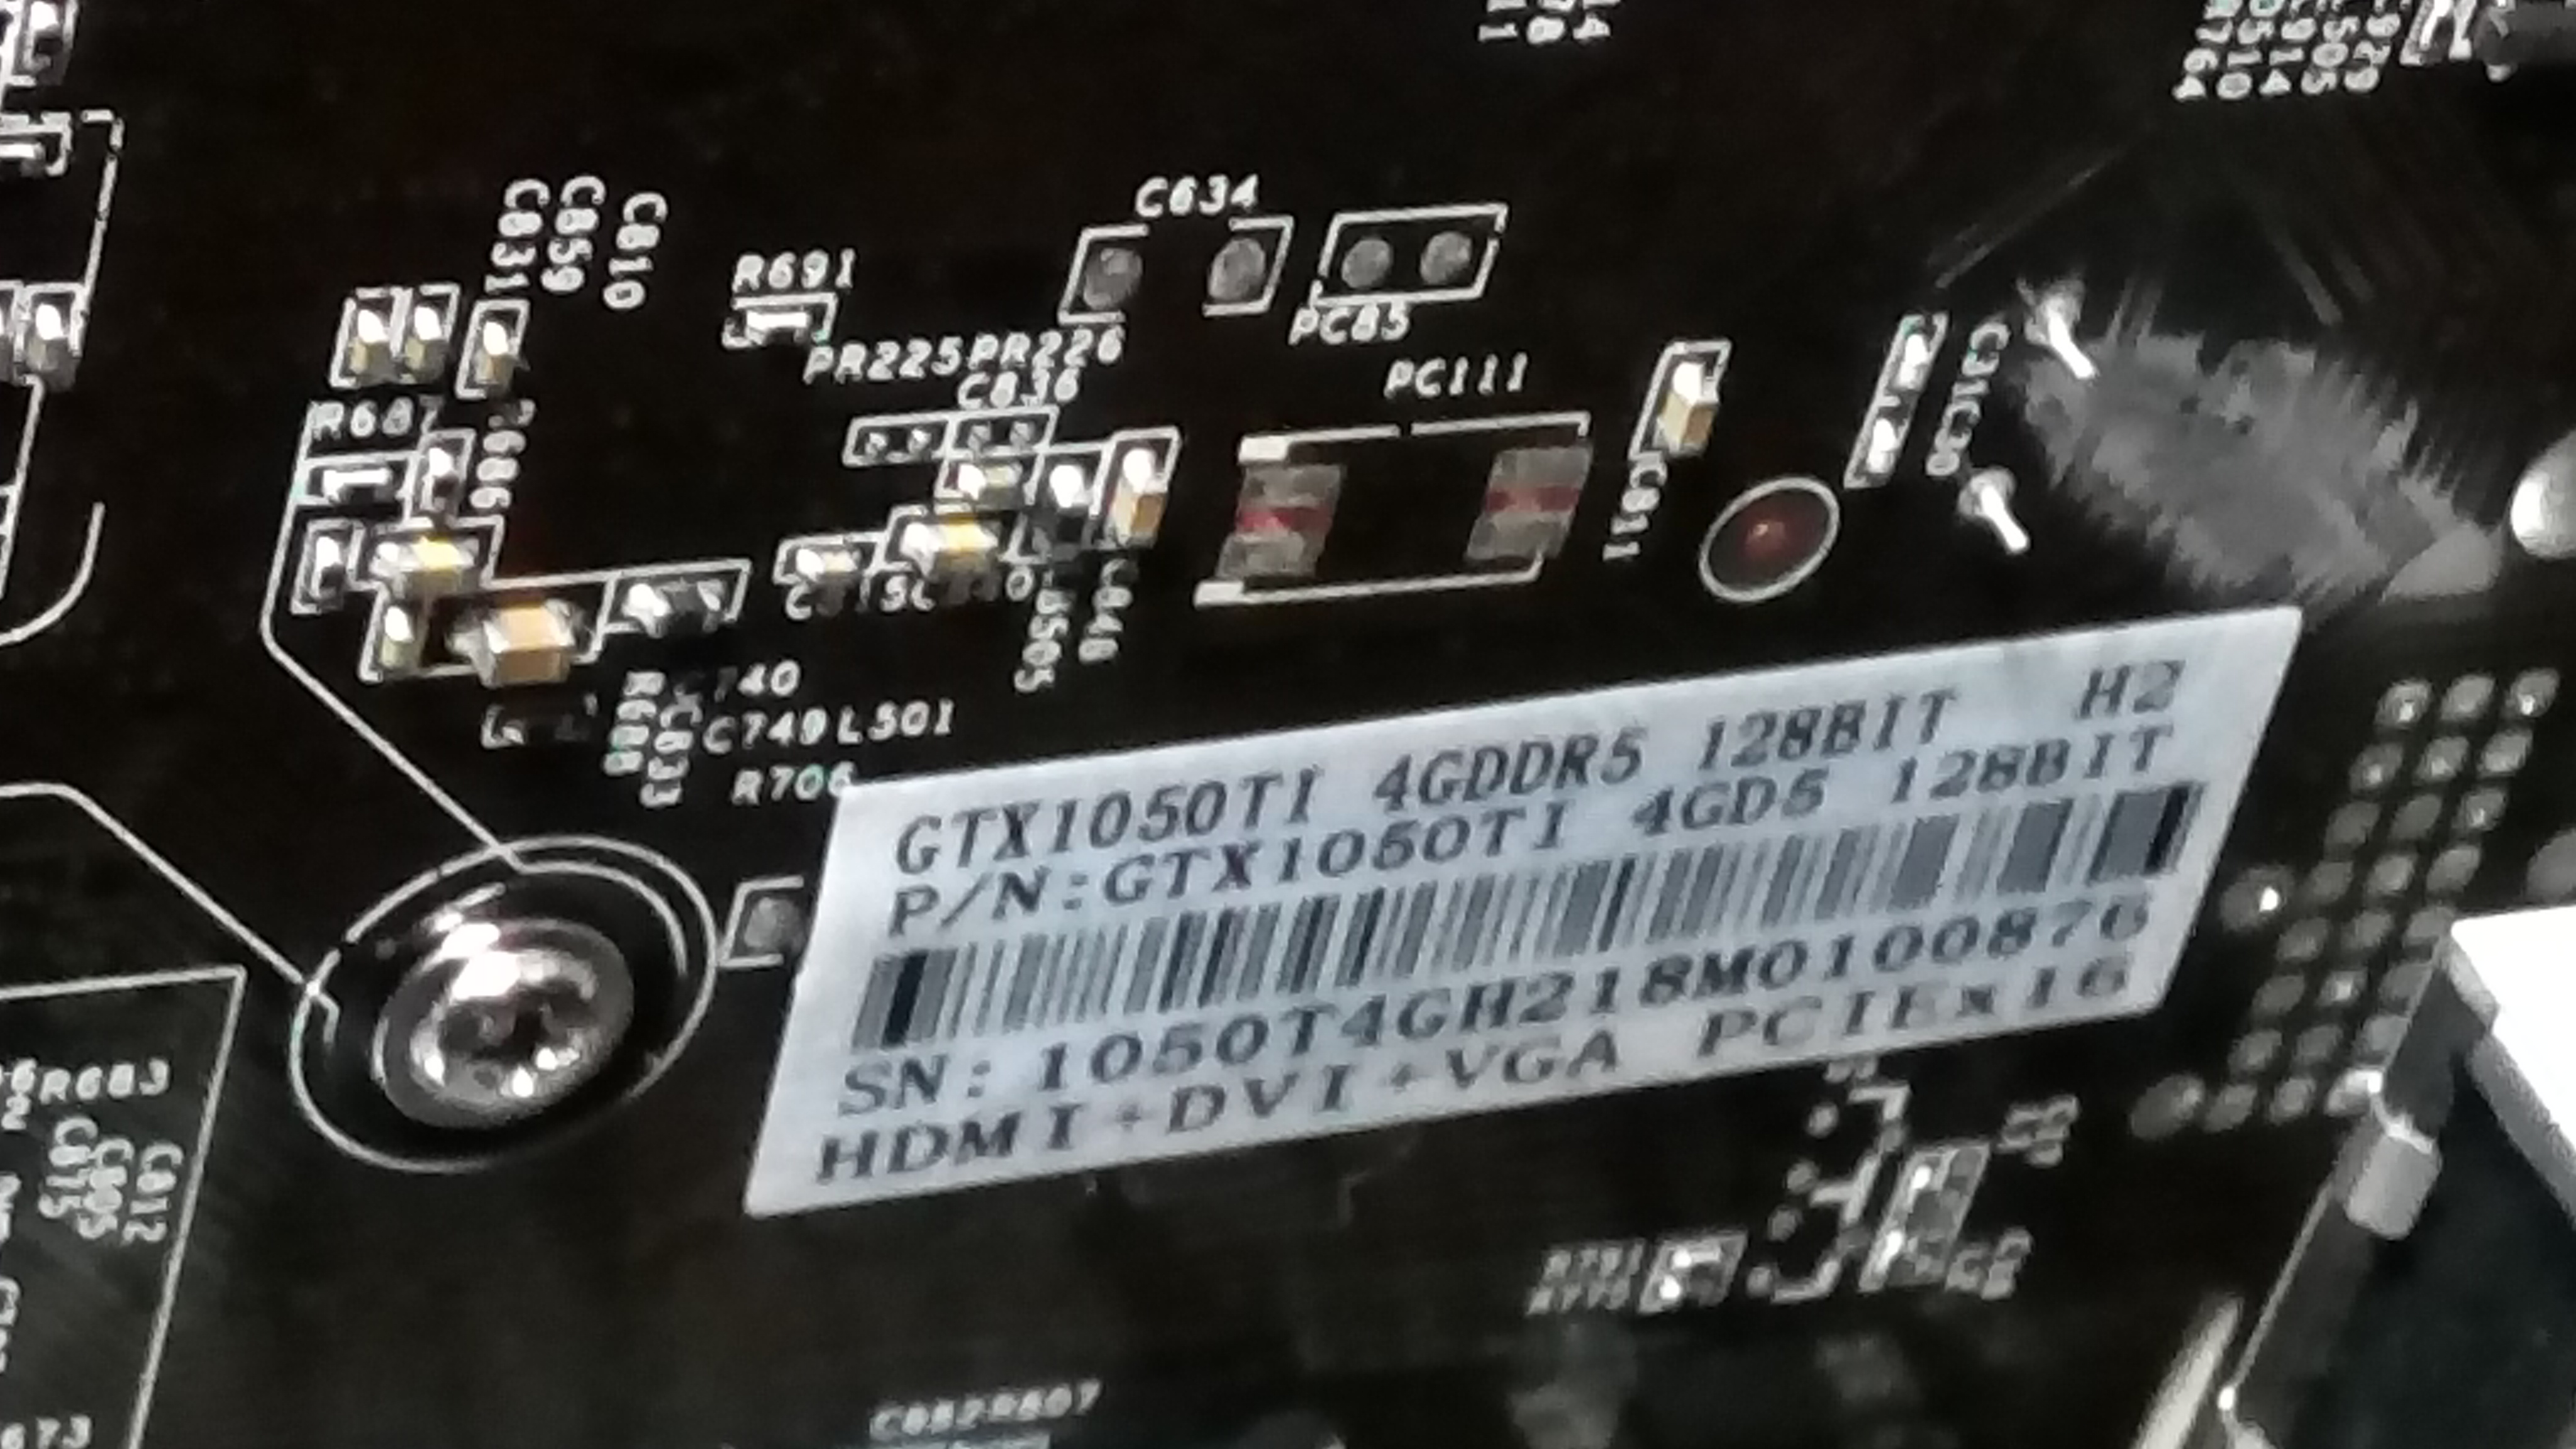 Fake video card GForce GTX 1050ti   Downgrade bios to GTS